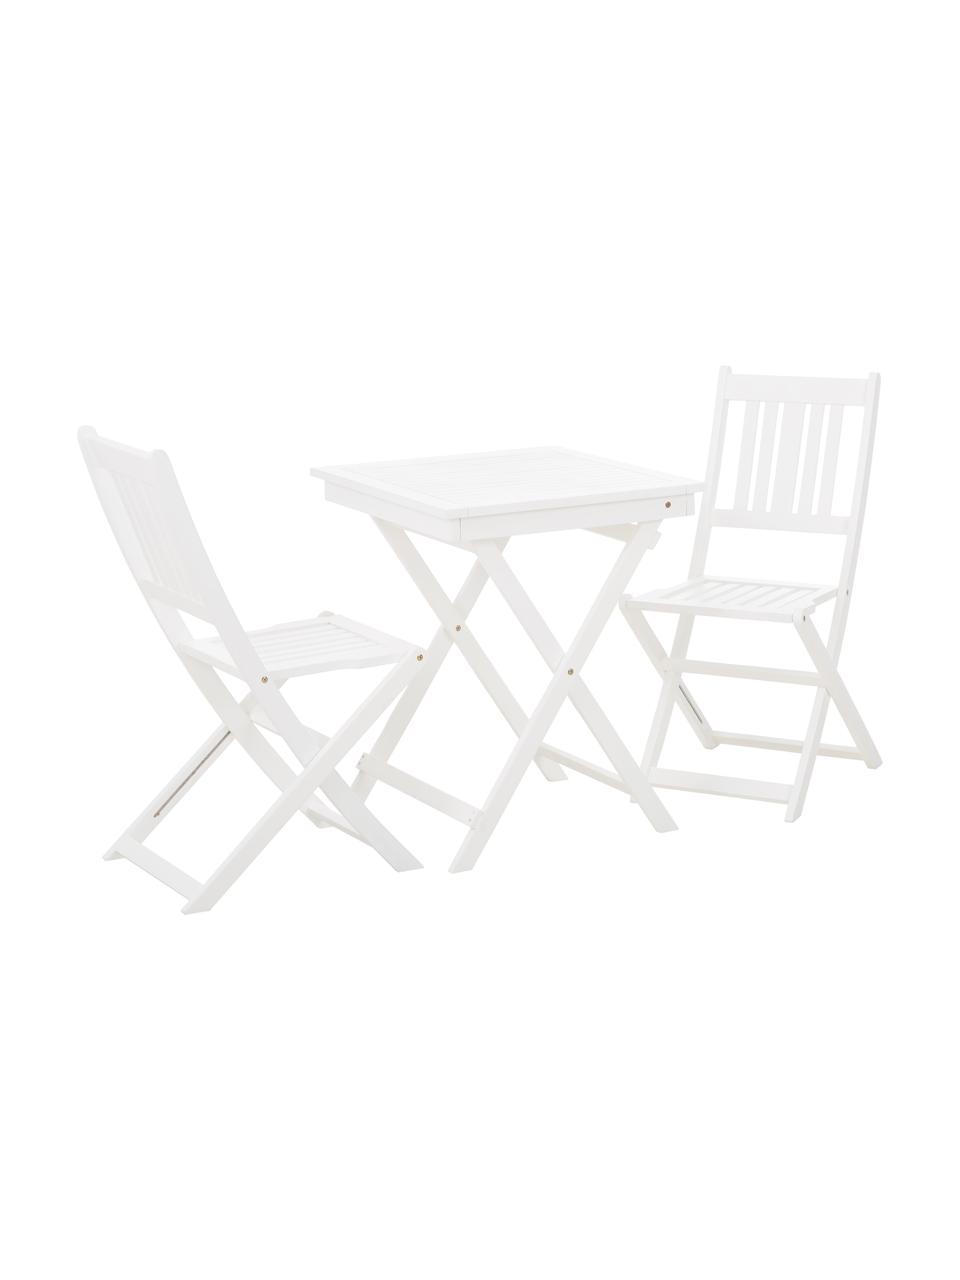 Set tavolo e sedie da giardino in legno di acacia Skyler 3 pz, Bianco, Set in varie misure